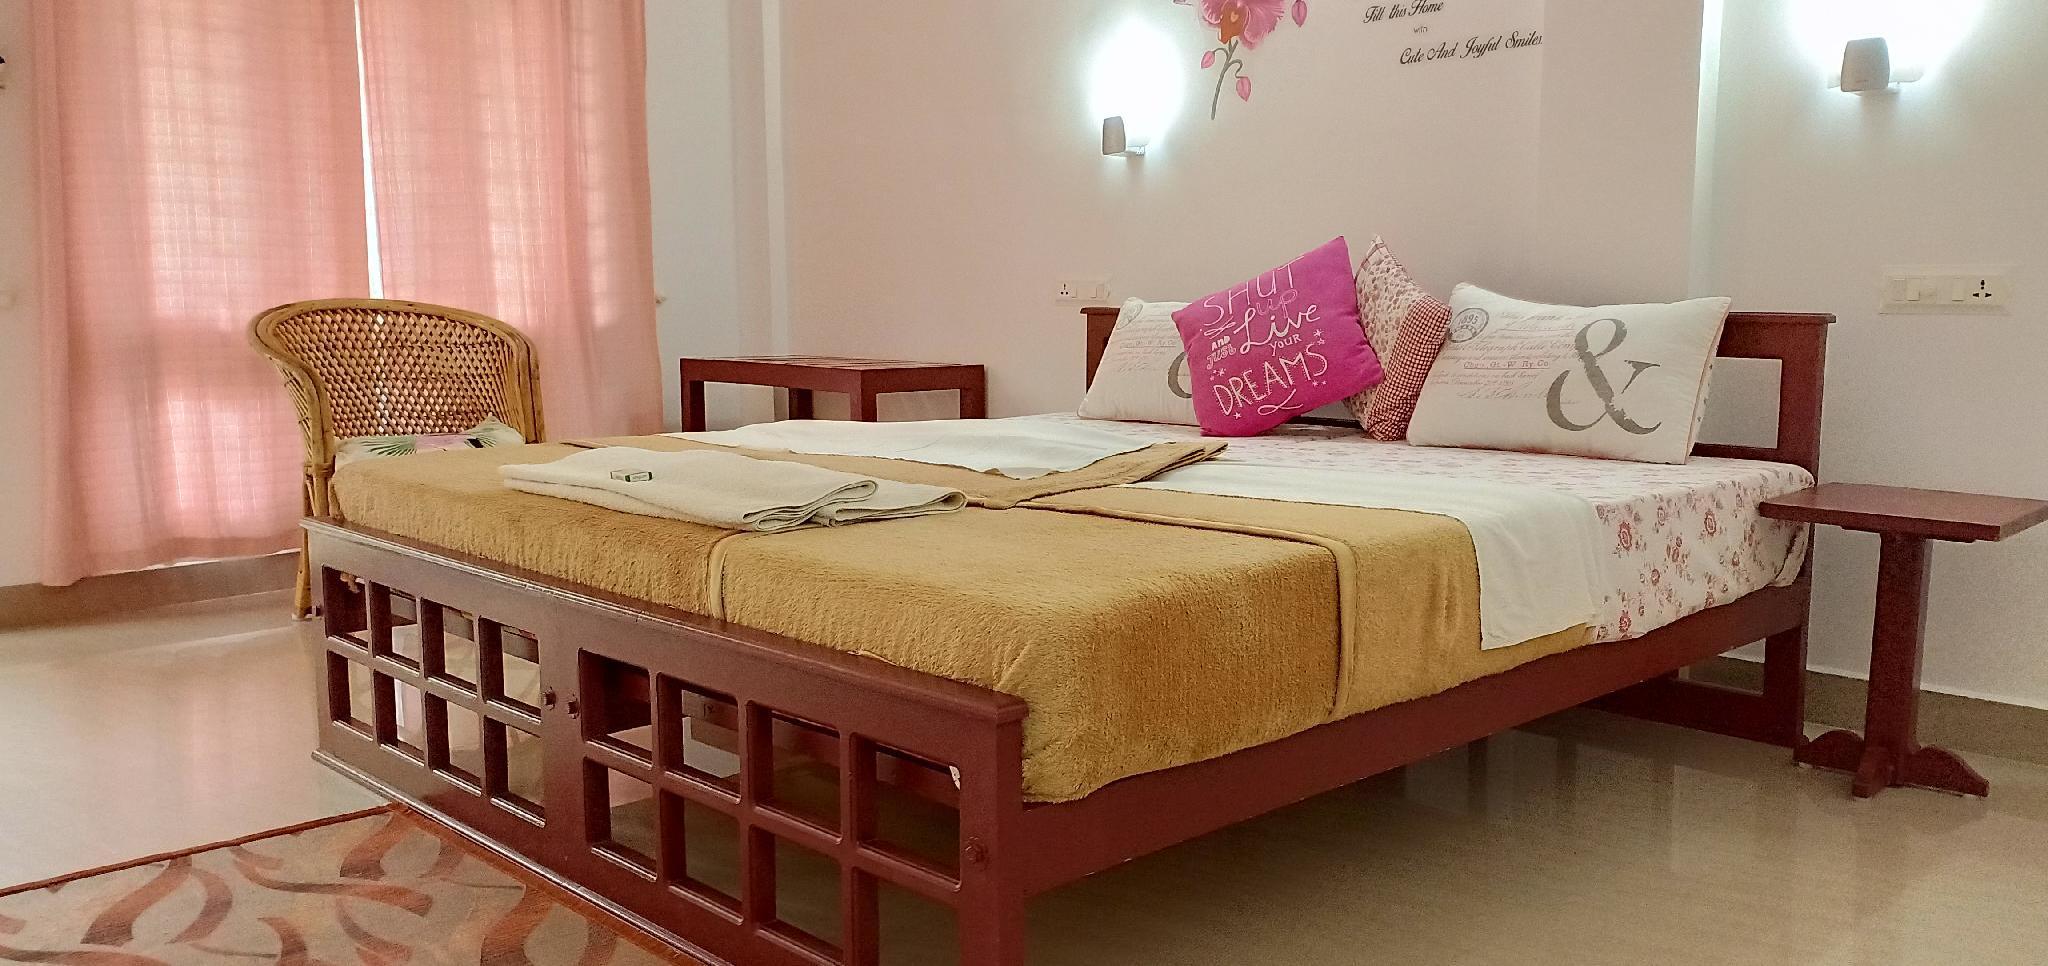 Periyar Inn, Theni